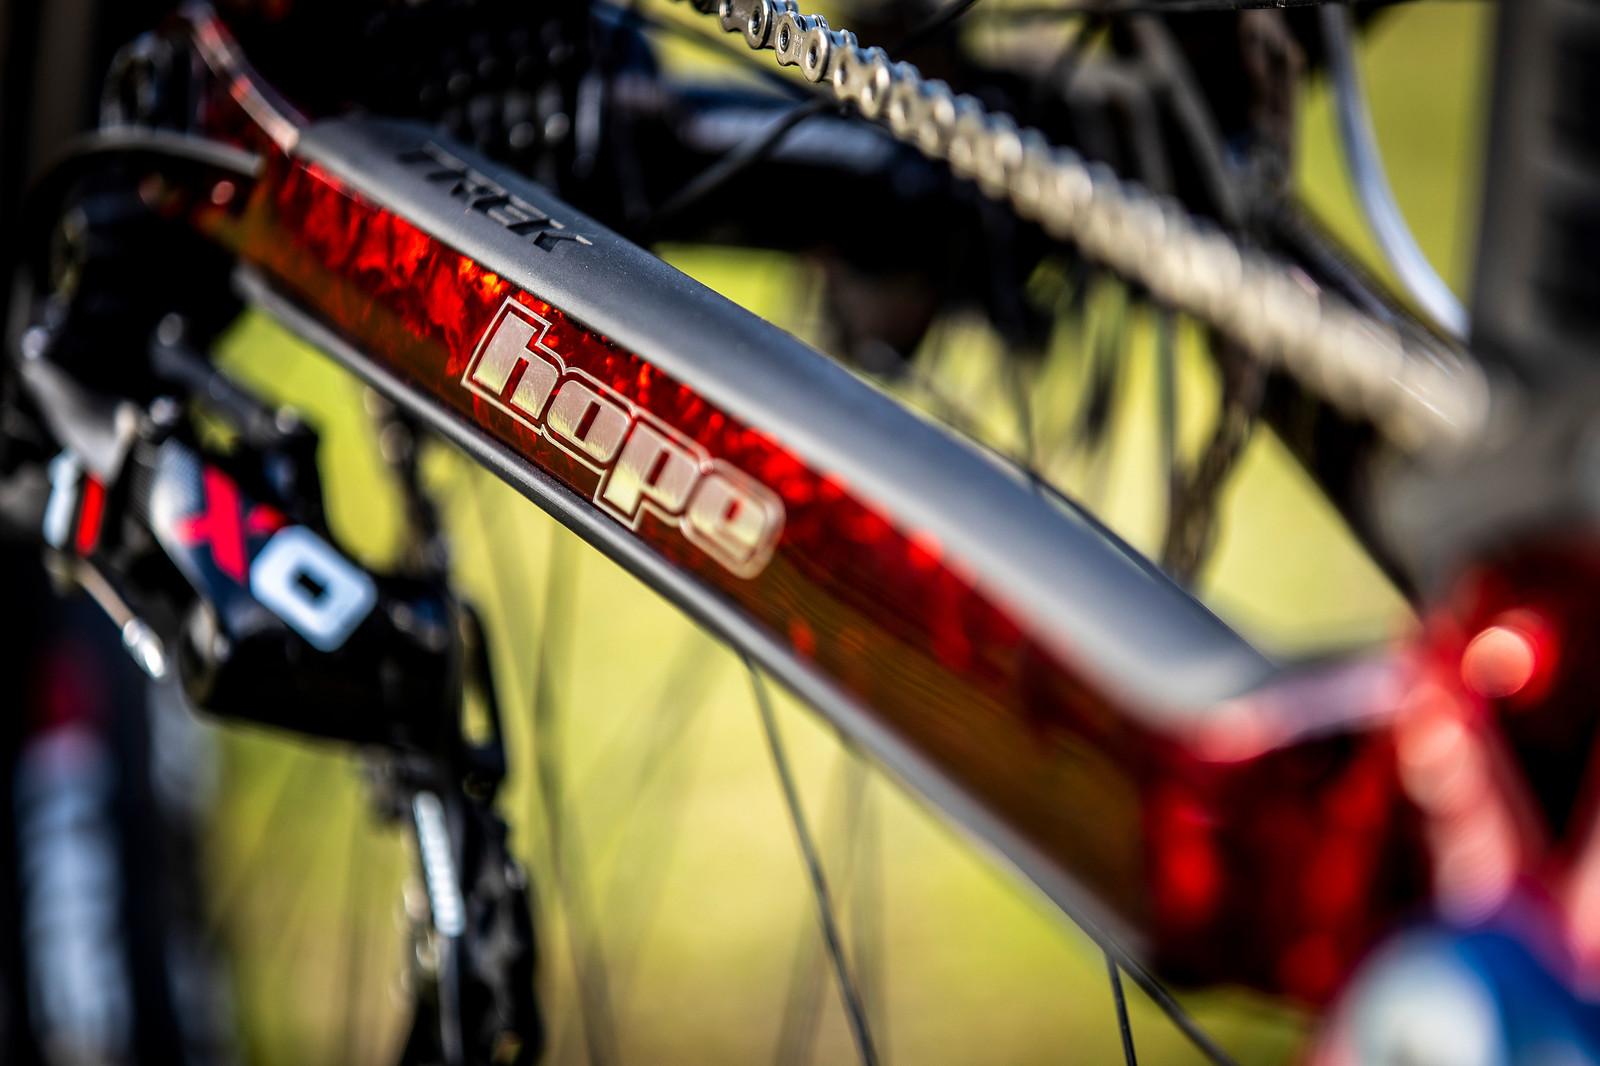 A New Hope - WORLD CHAMPS BIKE - Kade Edwards' Trek Session - Mountain Biking Pictures - Vital MTB